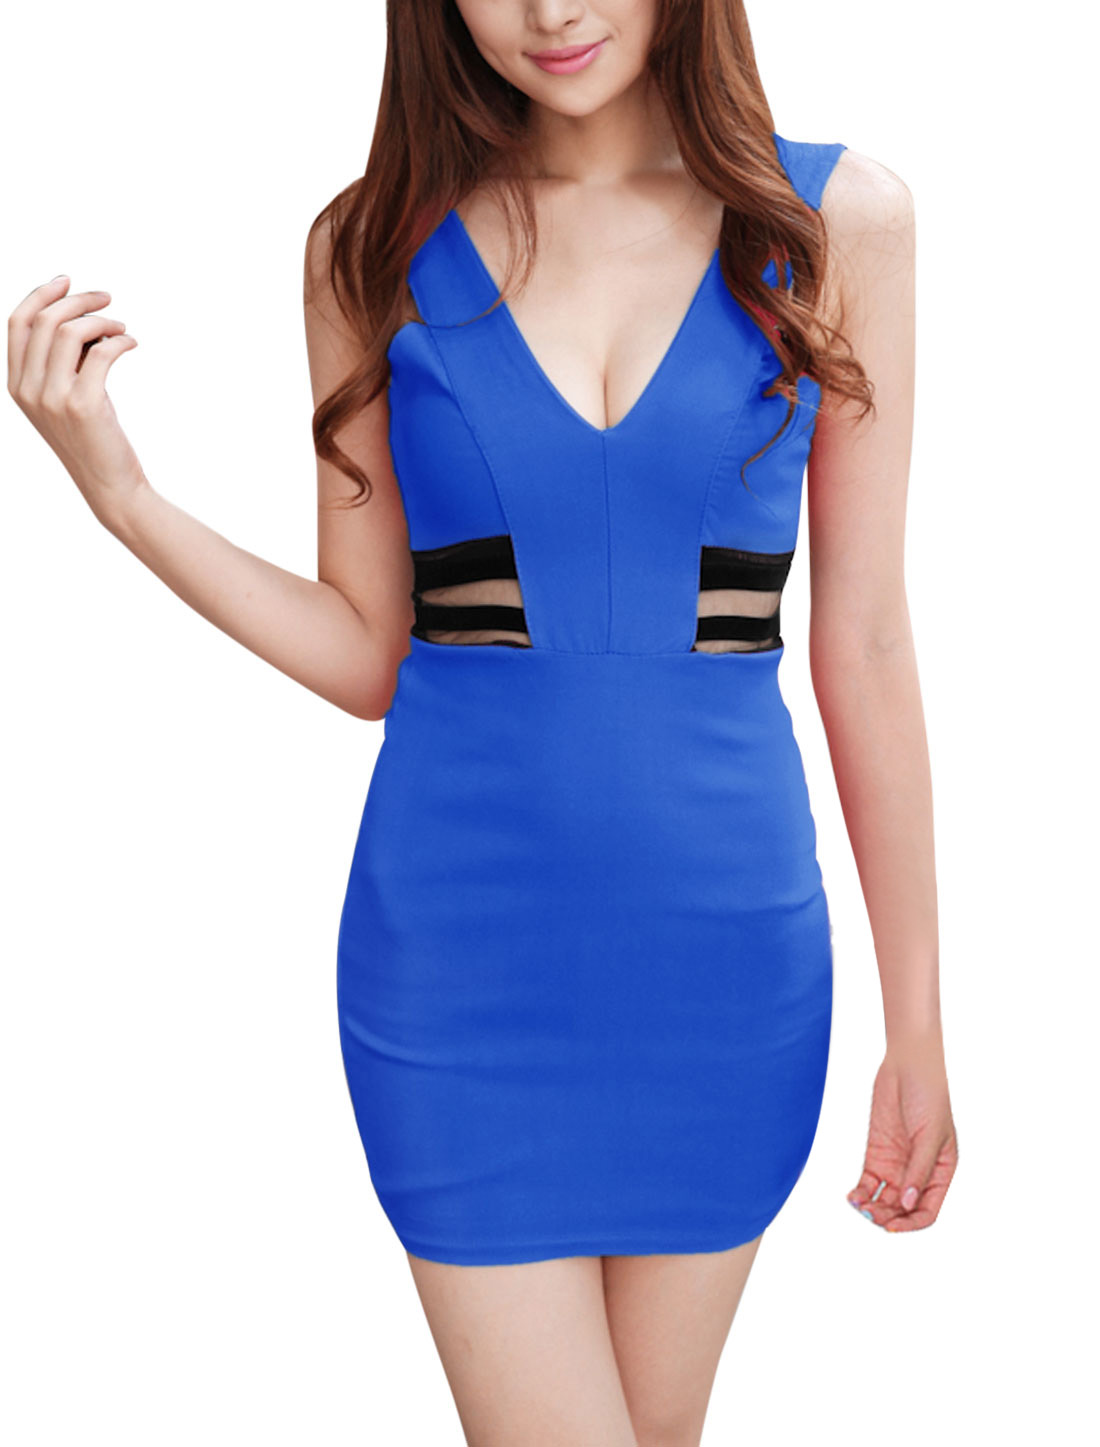 Ladies Club Wear Shoulder Straps Pullover Royal Blue Sheath Blue XS